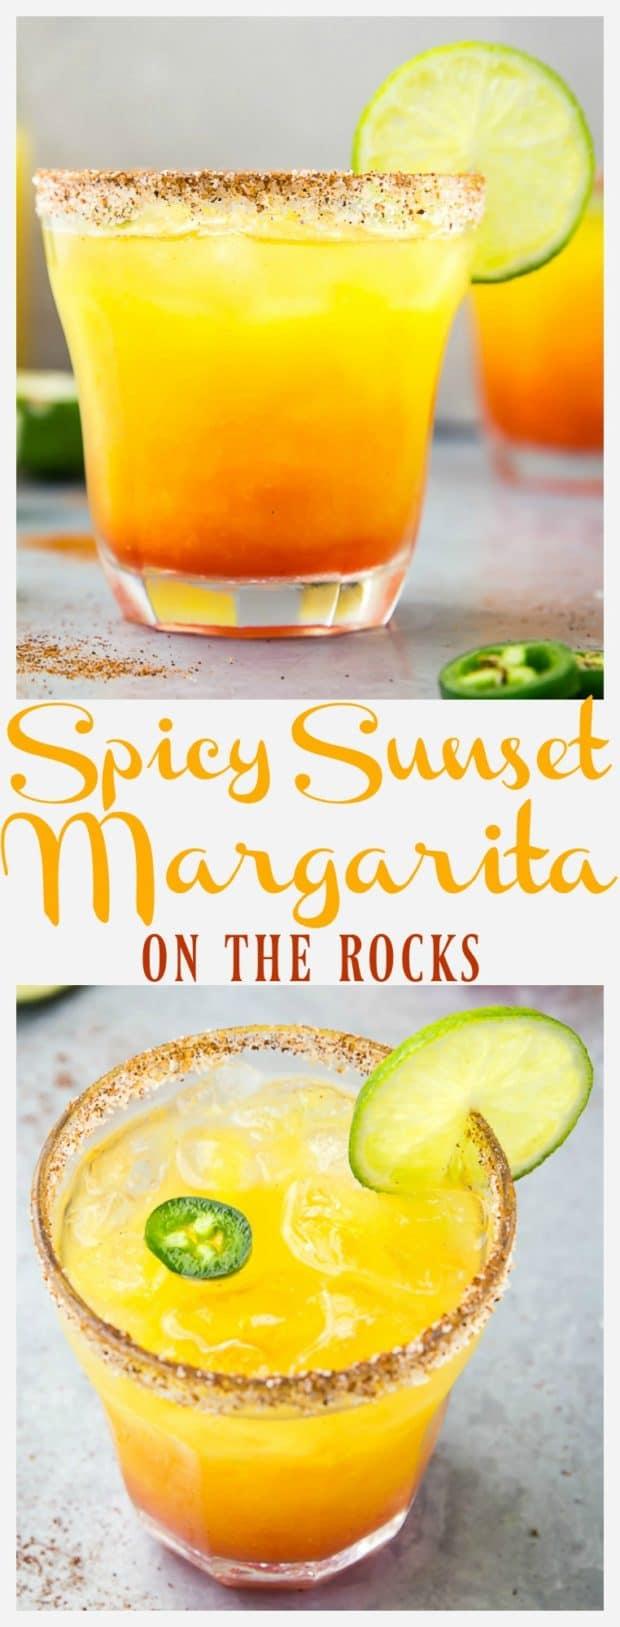 Spicy Sunset Margarita On The Rocks